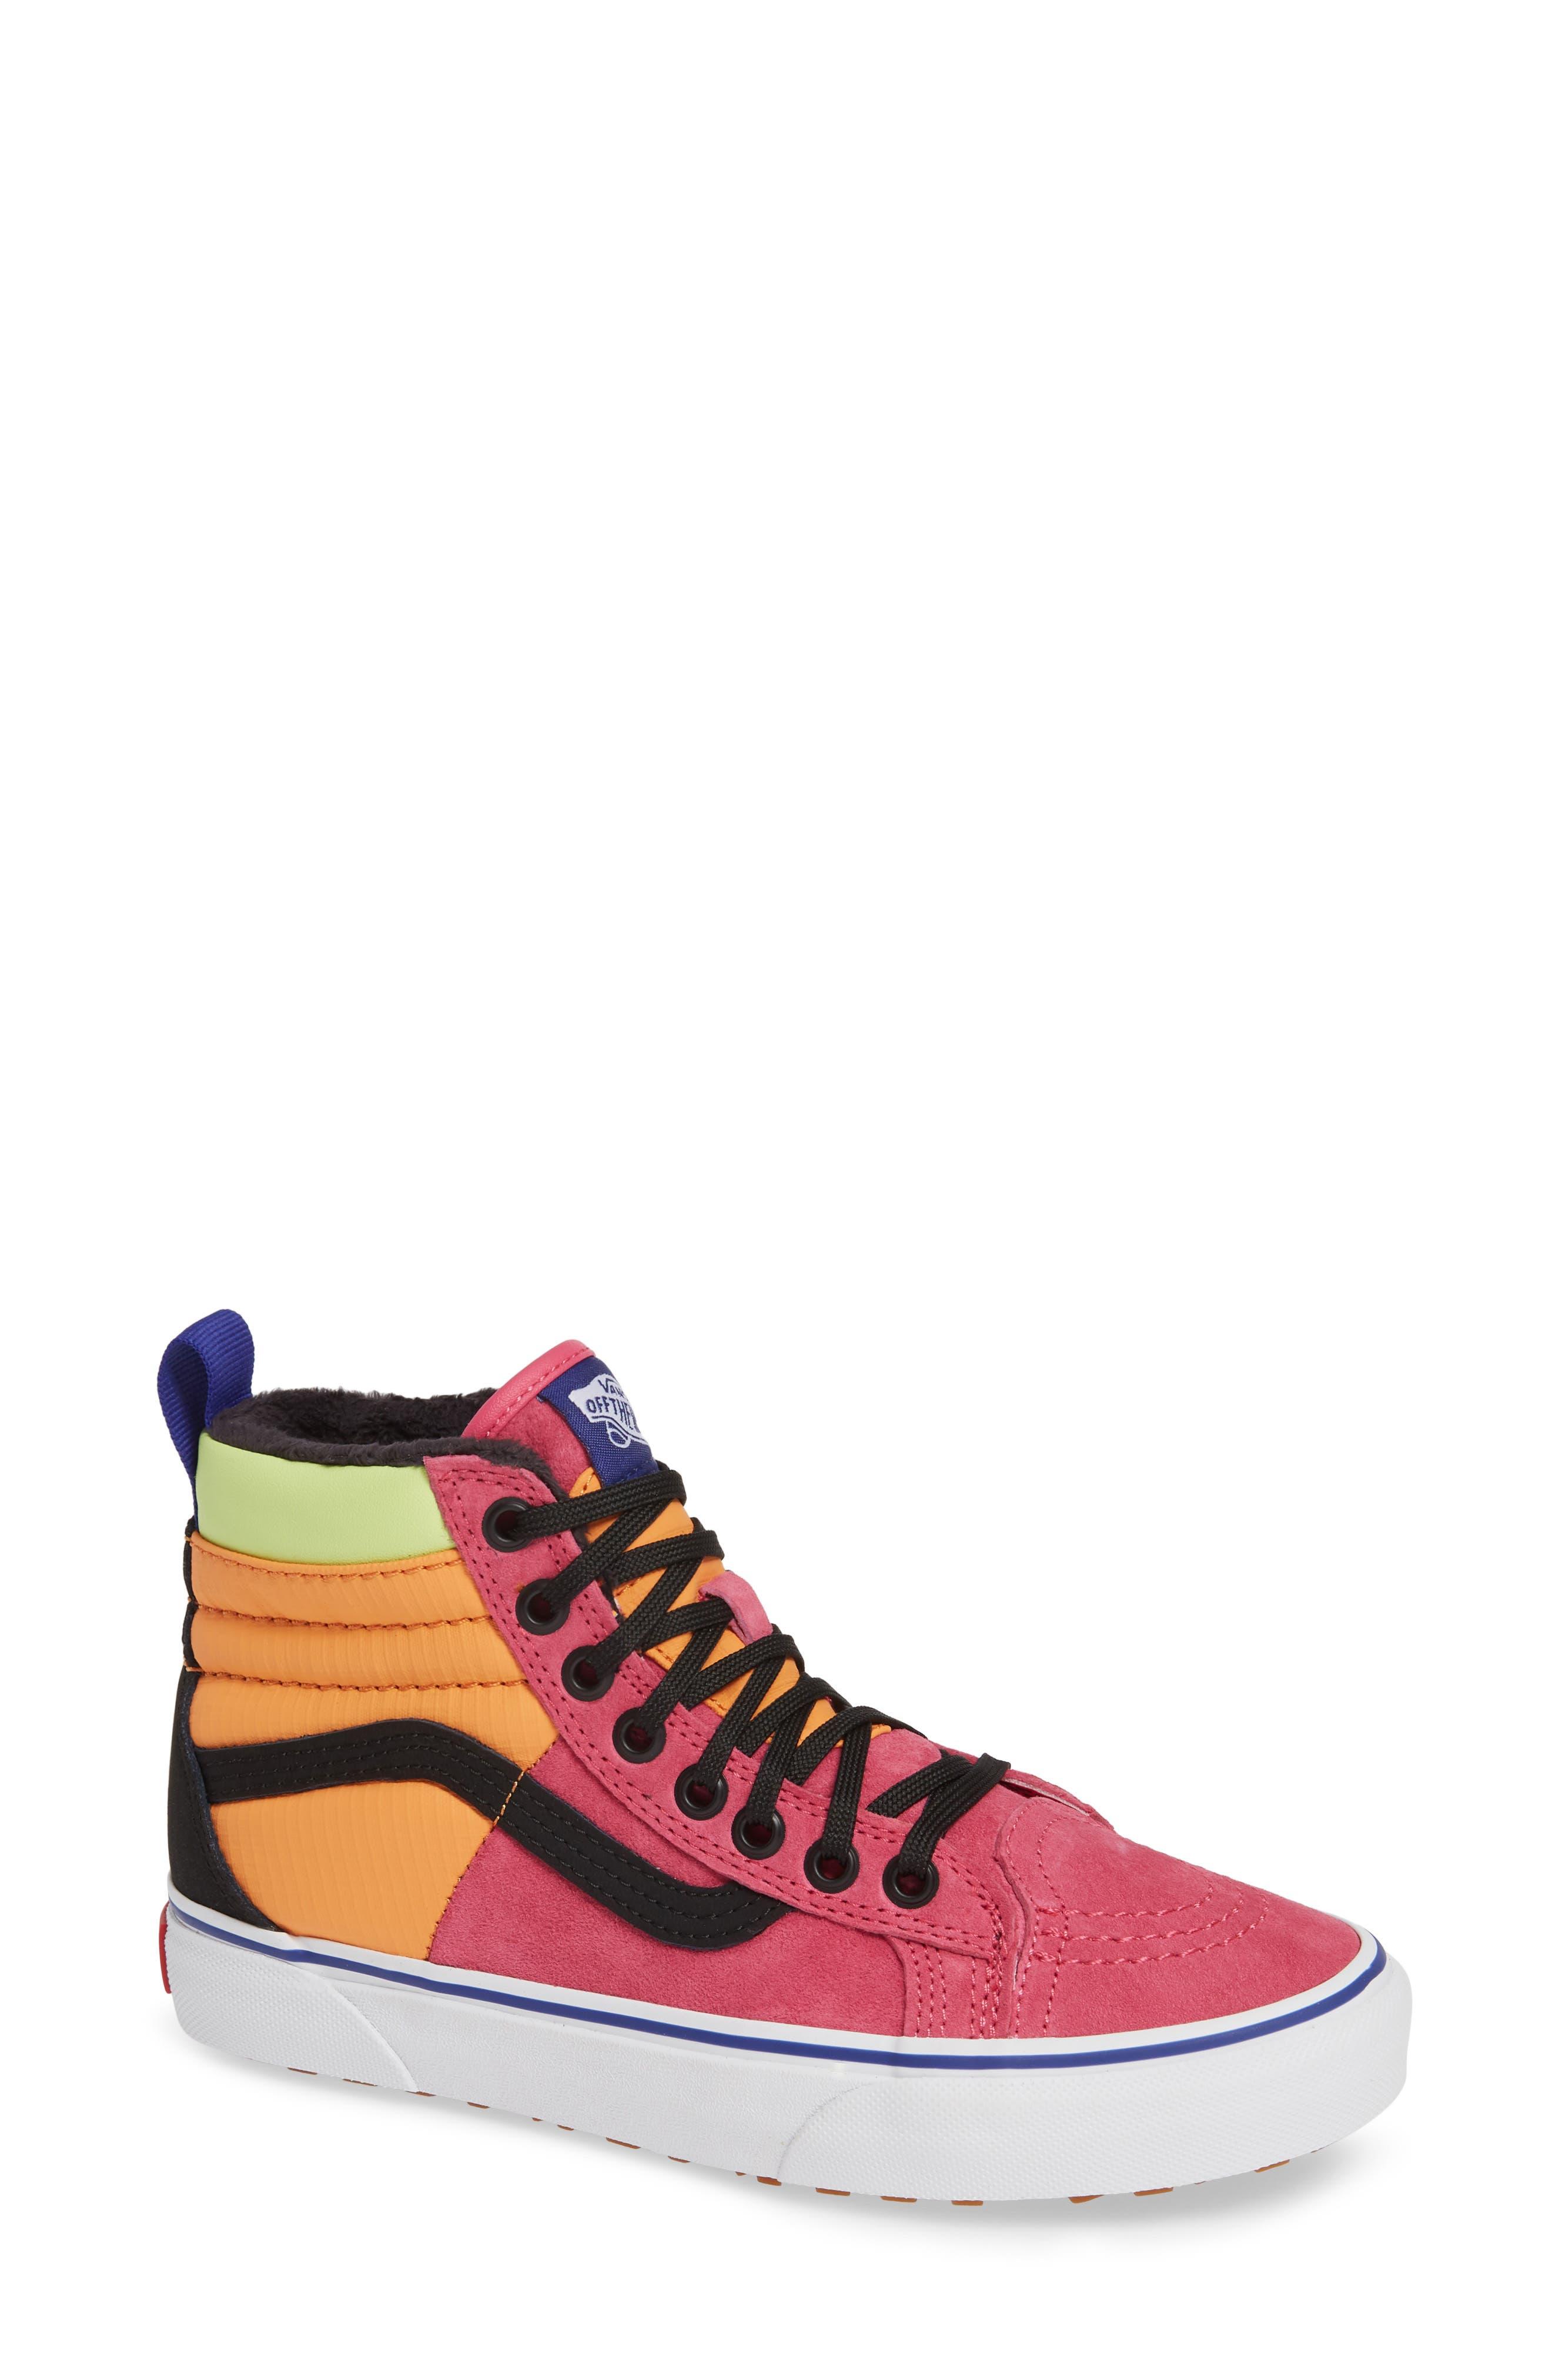 VANS,                             Sk8-Hi 46 MTE DX Sneaker,                             Main thumbnail 1, color,                             PINK YARROW/ TANGERINE/ BLACK